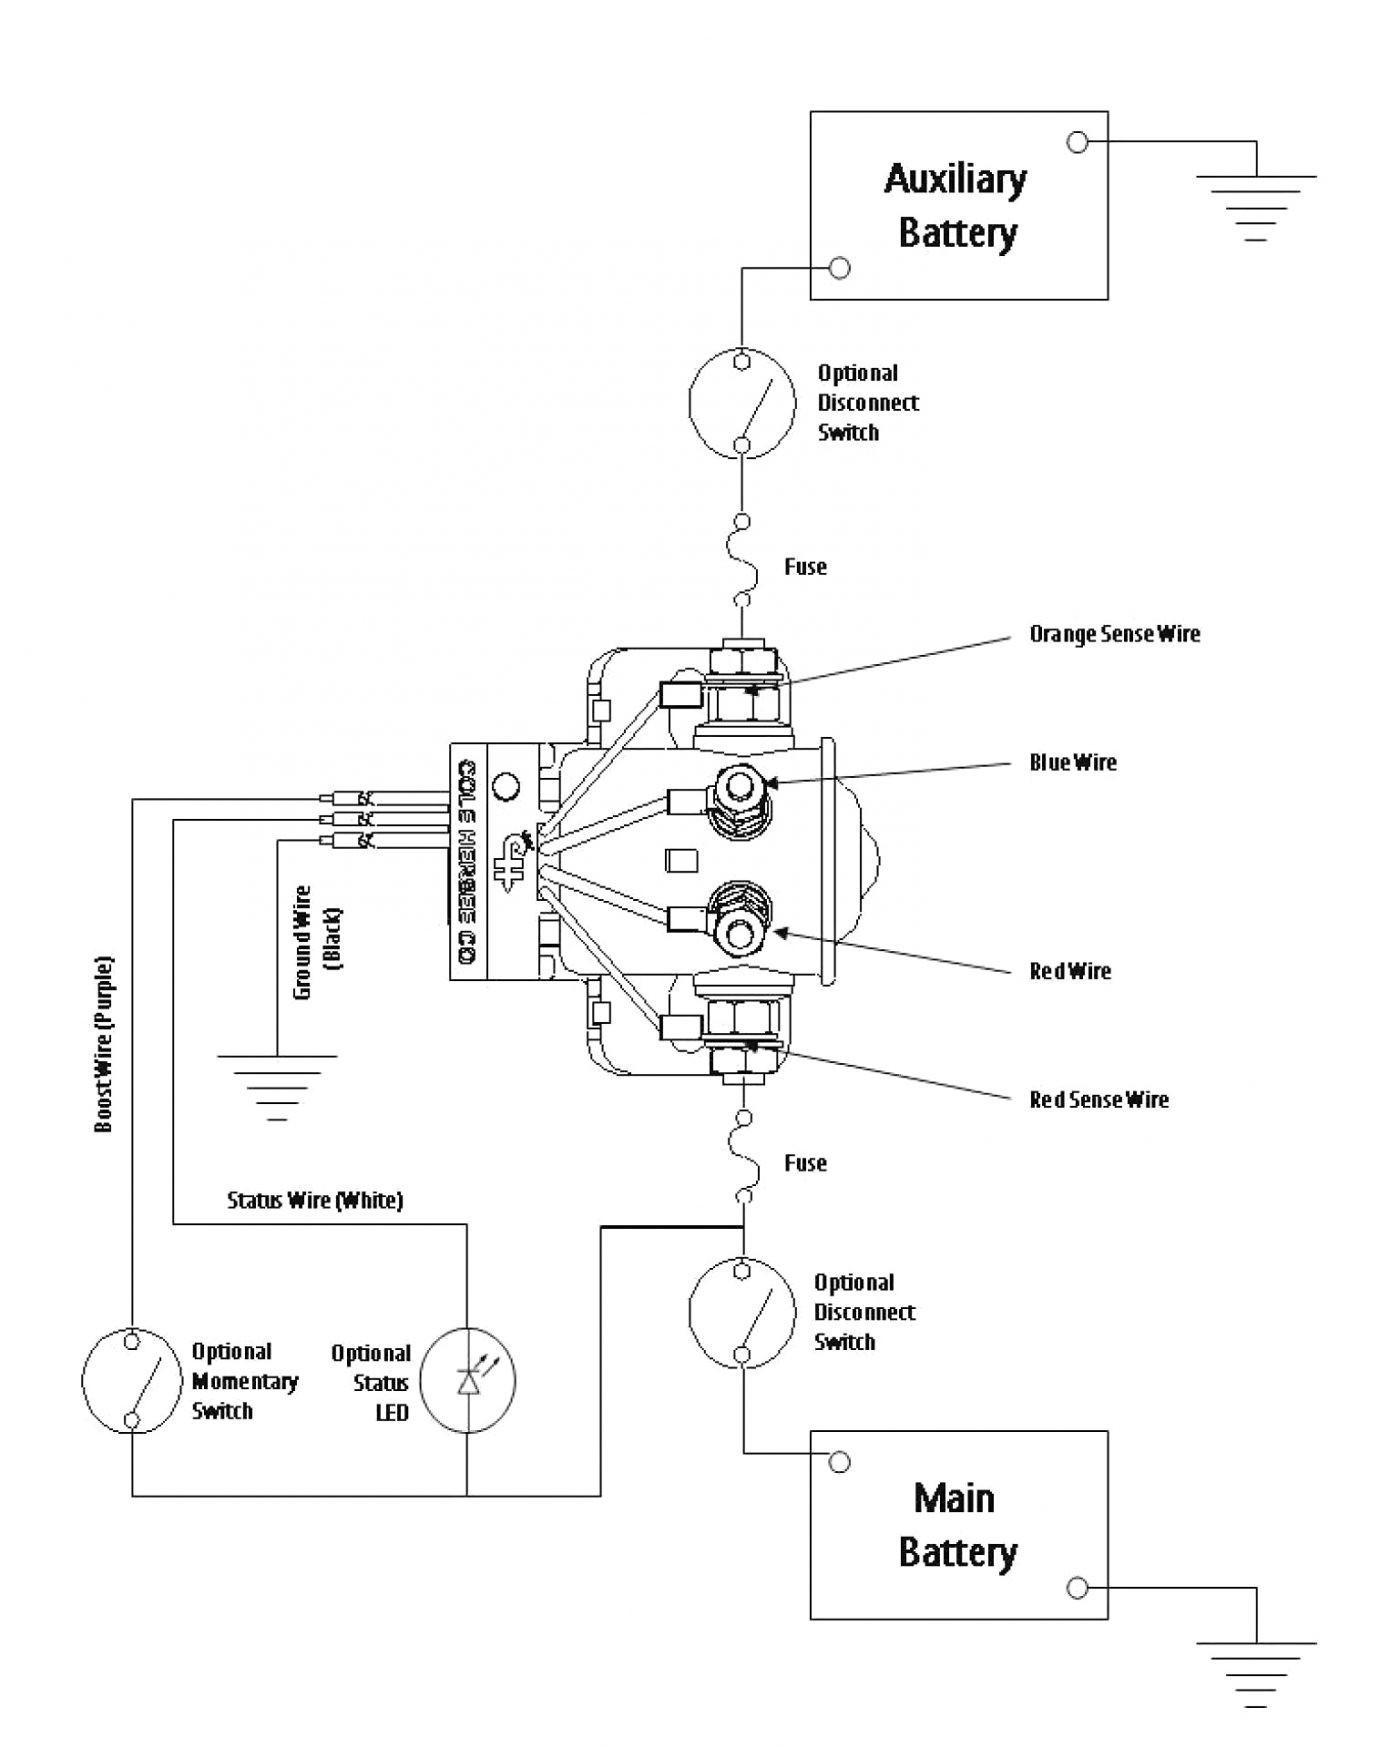 Vdo Oil Electric Gauge Diagram Fe 1079] 11 Gauge Wire Diagram Free Diagram Of Vdo Oil Electric Gauge Diagram